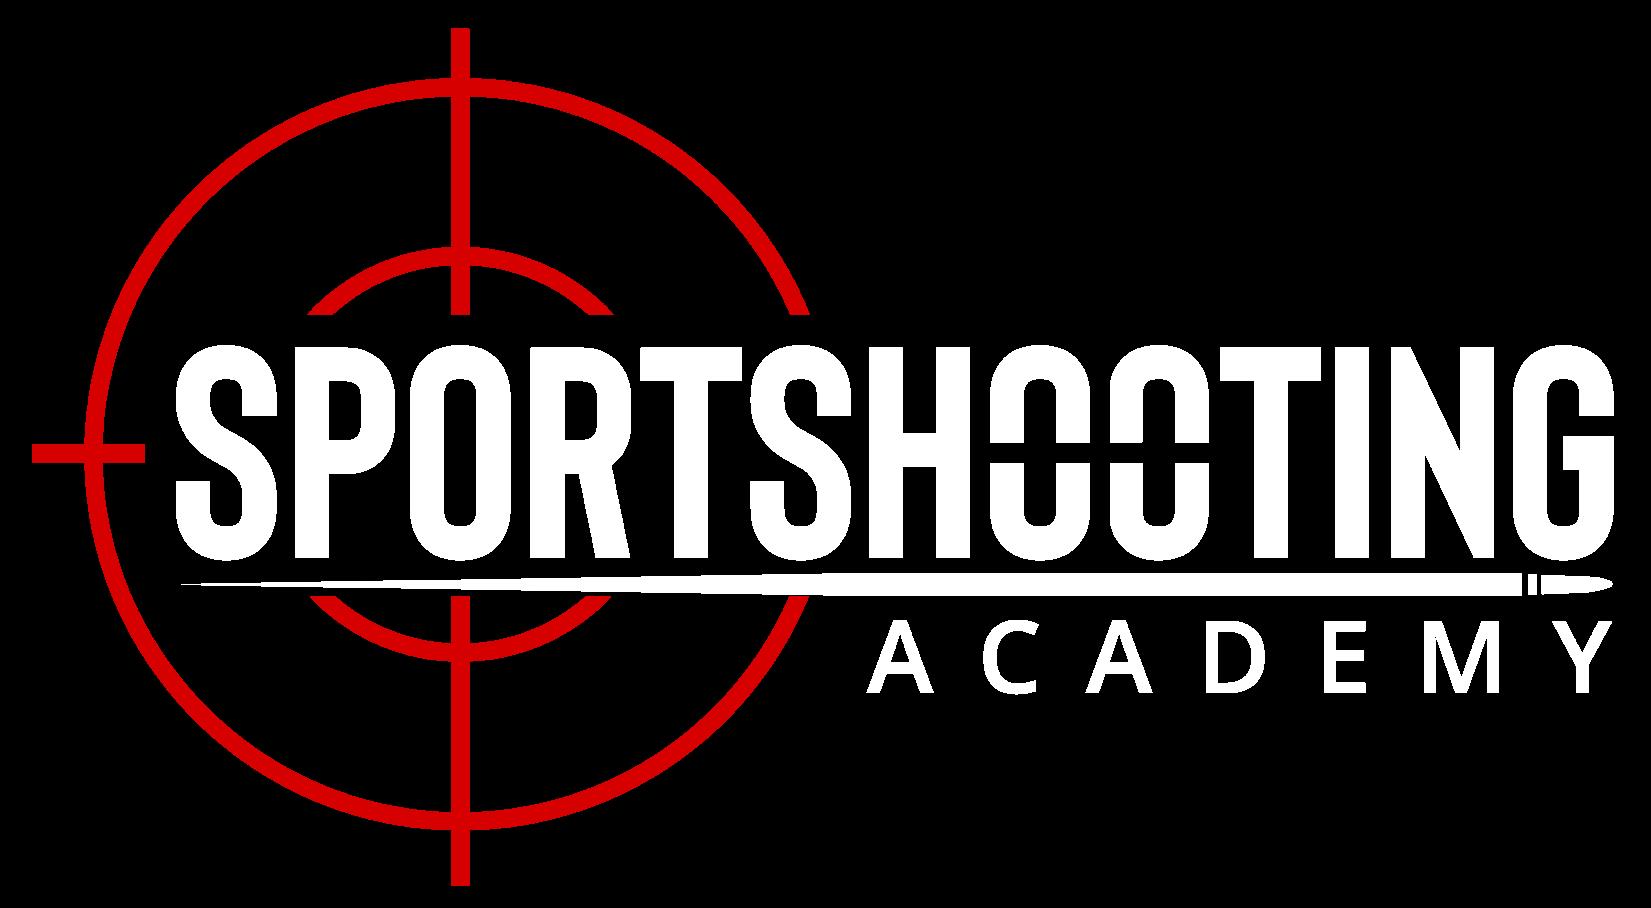 Sportshooting Academy